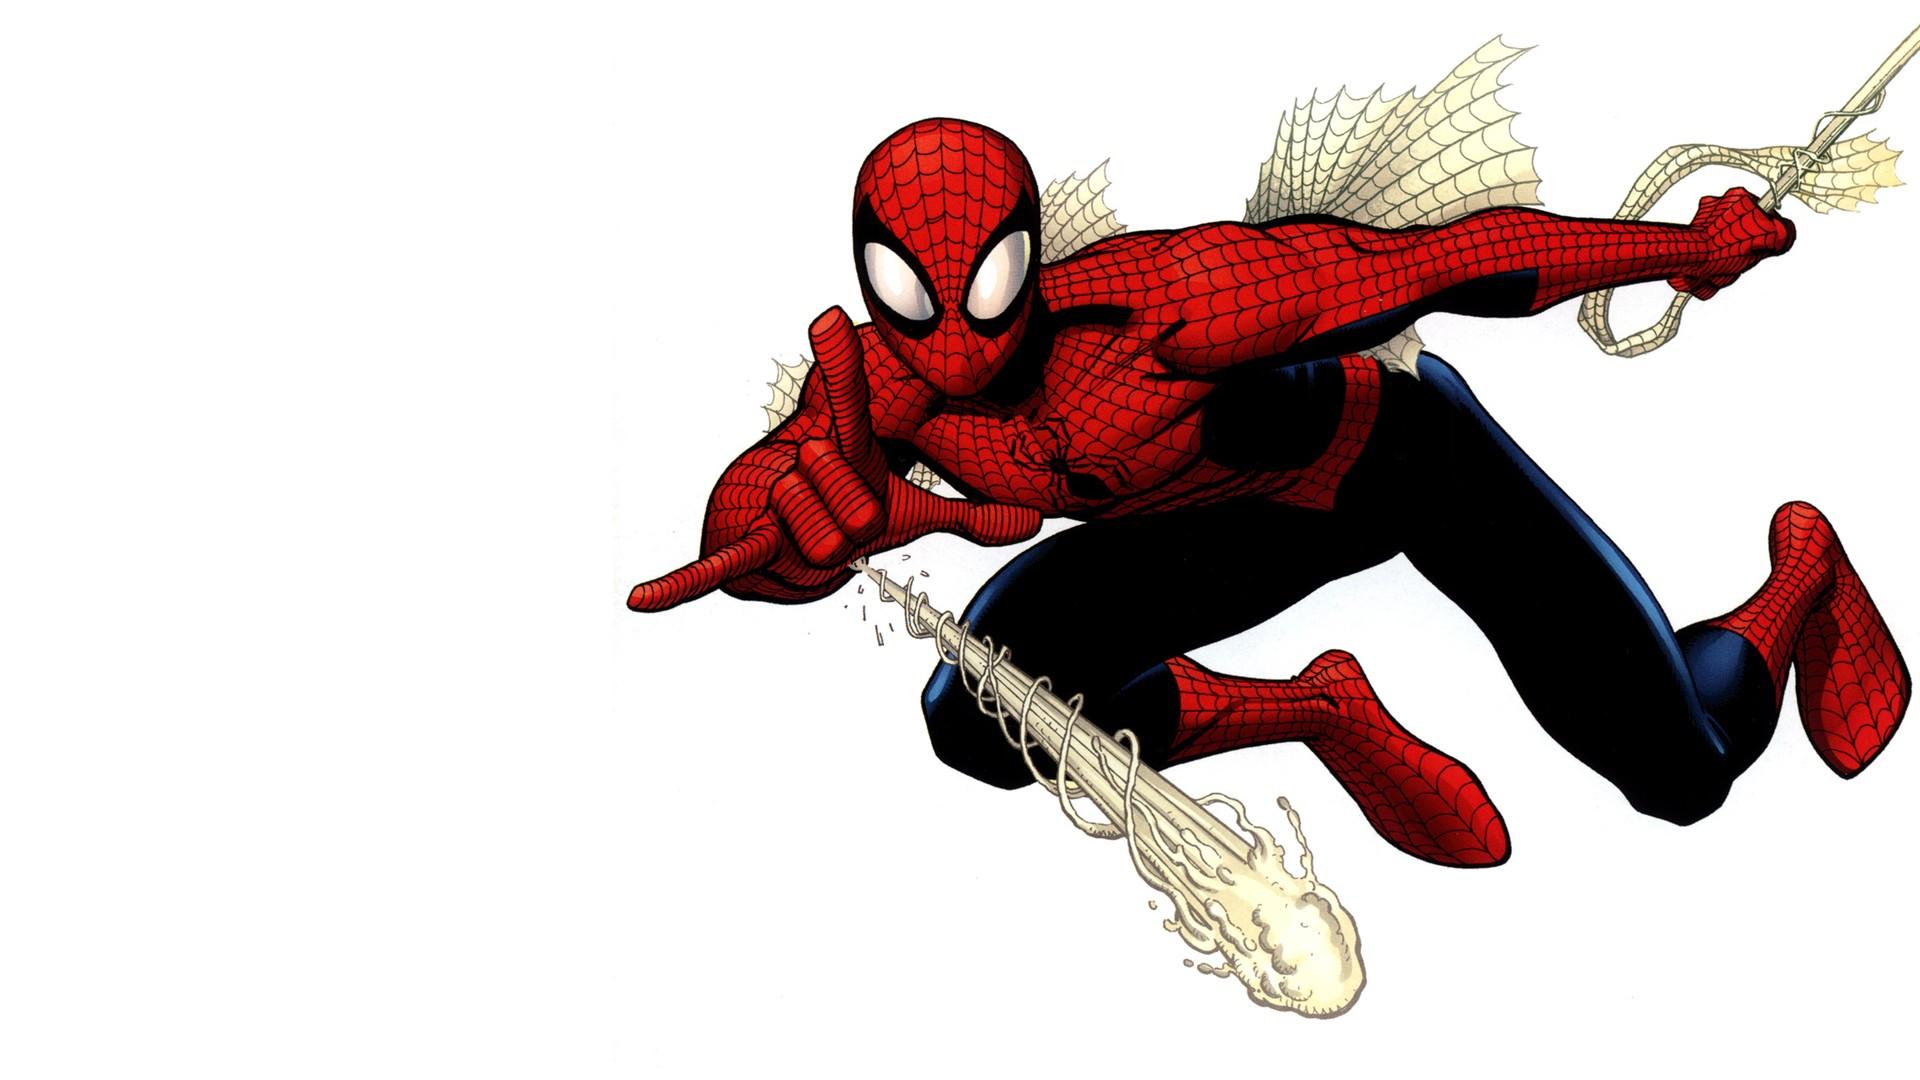 Картинки персонажа человек паук